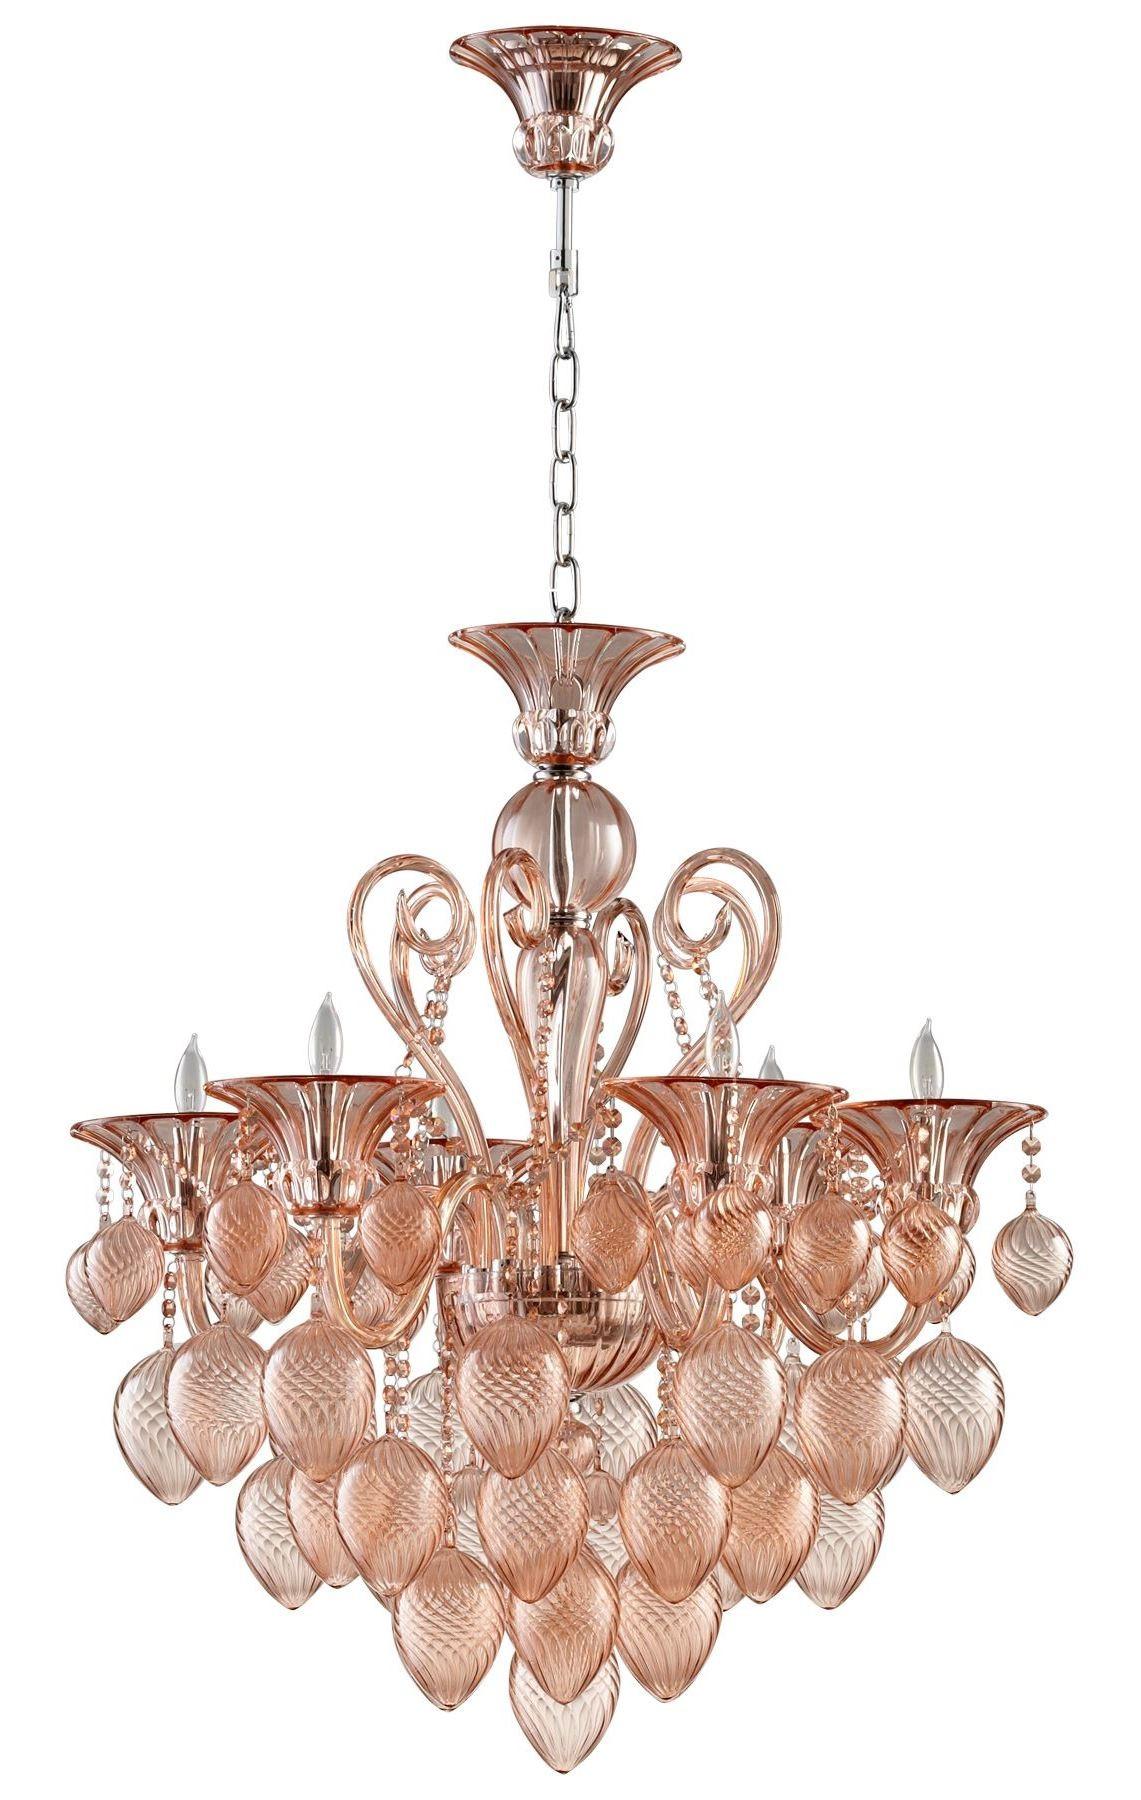 Lighting Blush Chandelier From Cyan Design 5503